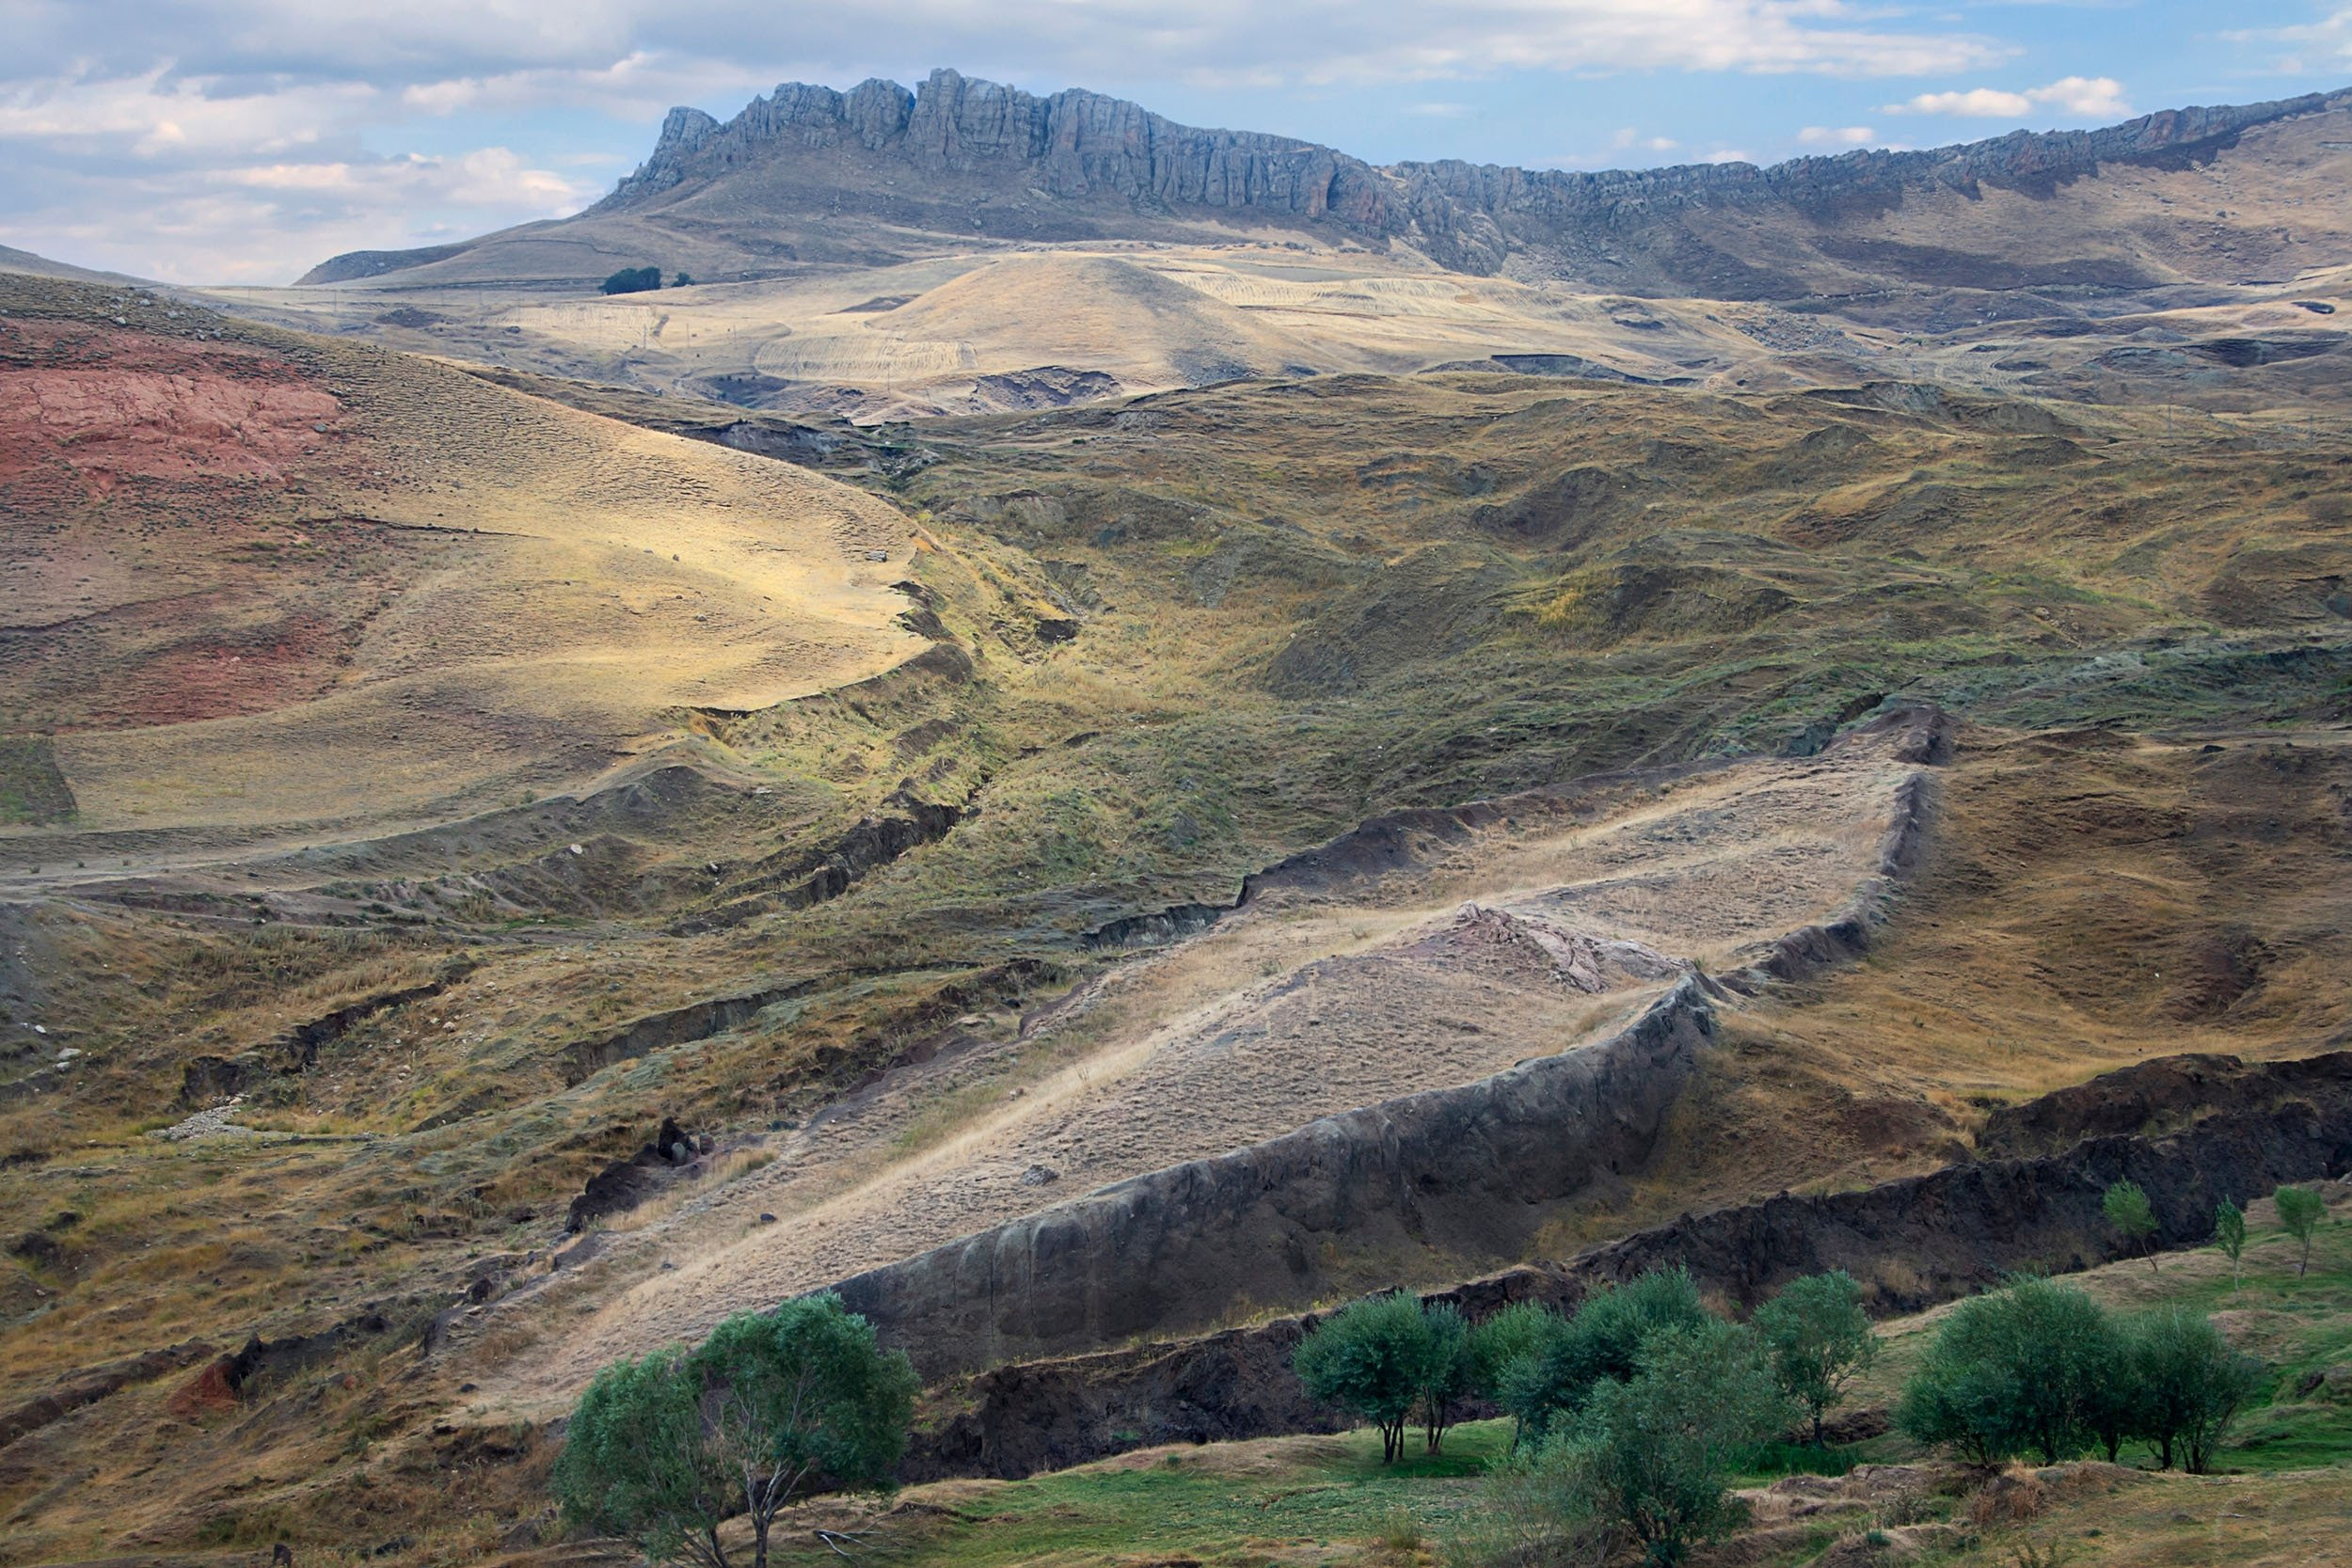 A boat-shaped rock formation some believe is the remains of Noah's Ark at the spot near Mount Ararat, in Doğubeyazıt, Ağrı, eastern Turkey. (Shutterstock Photo)